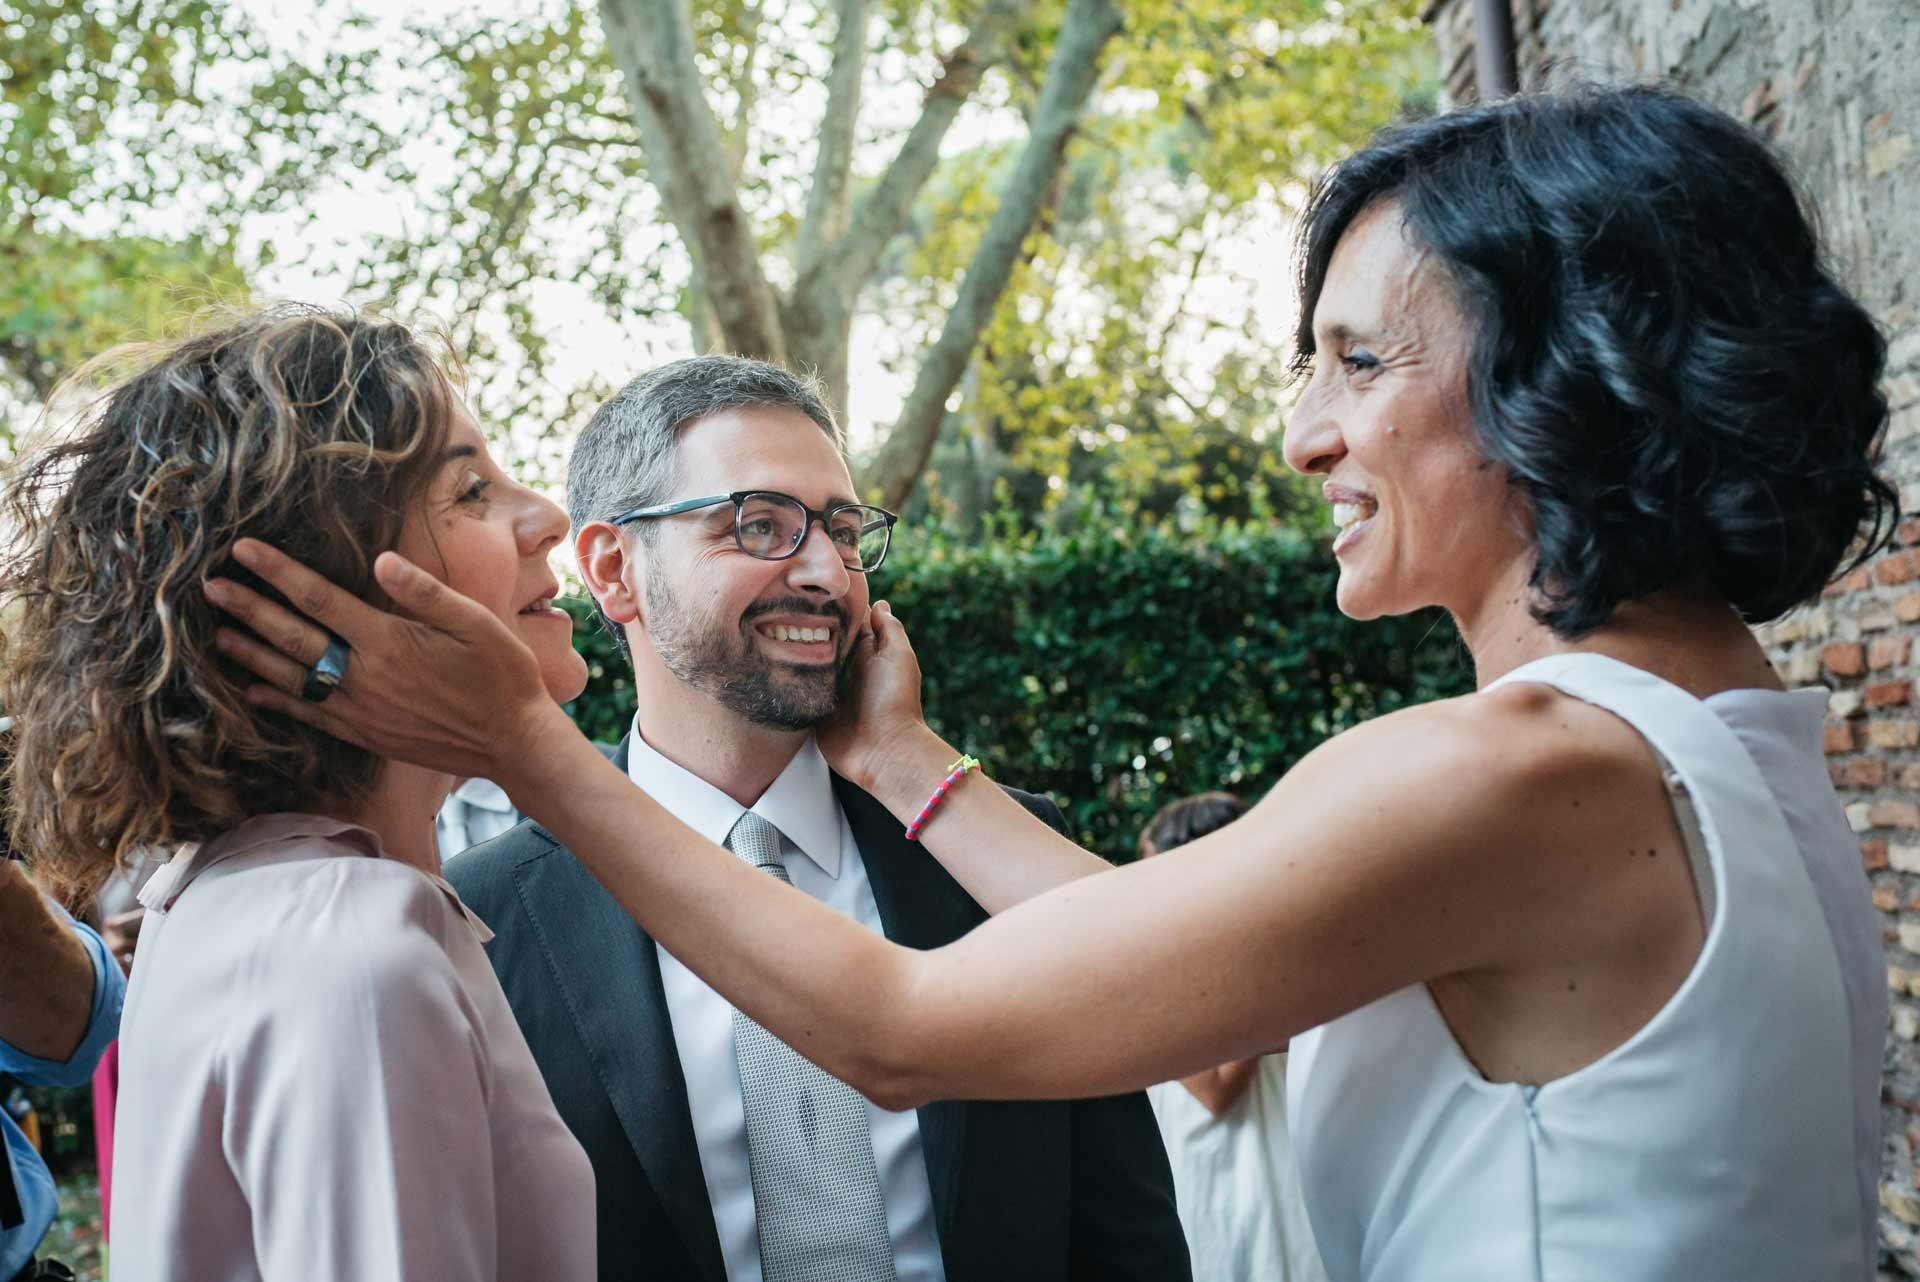 Unposed-wedding-photography-1